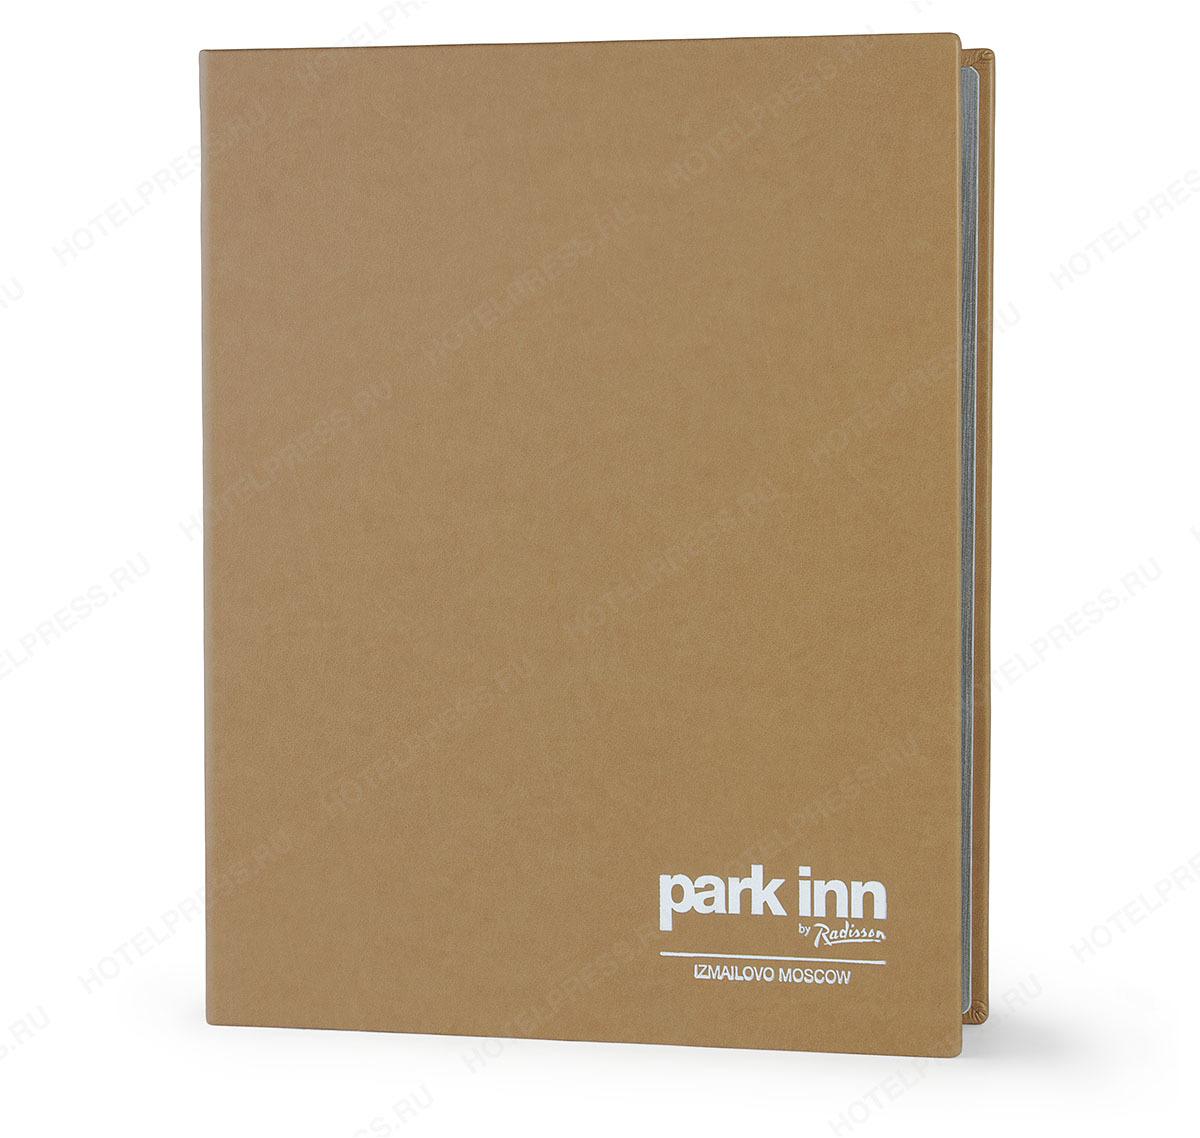 Папка отеля park Inn